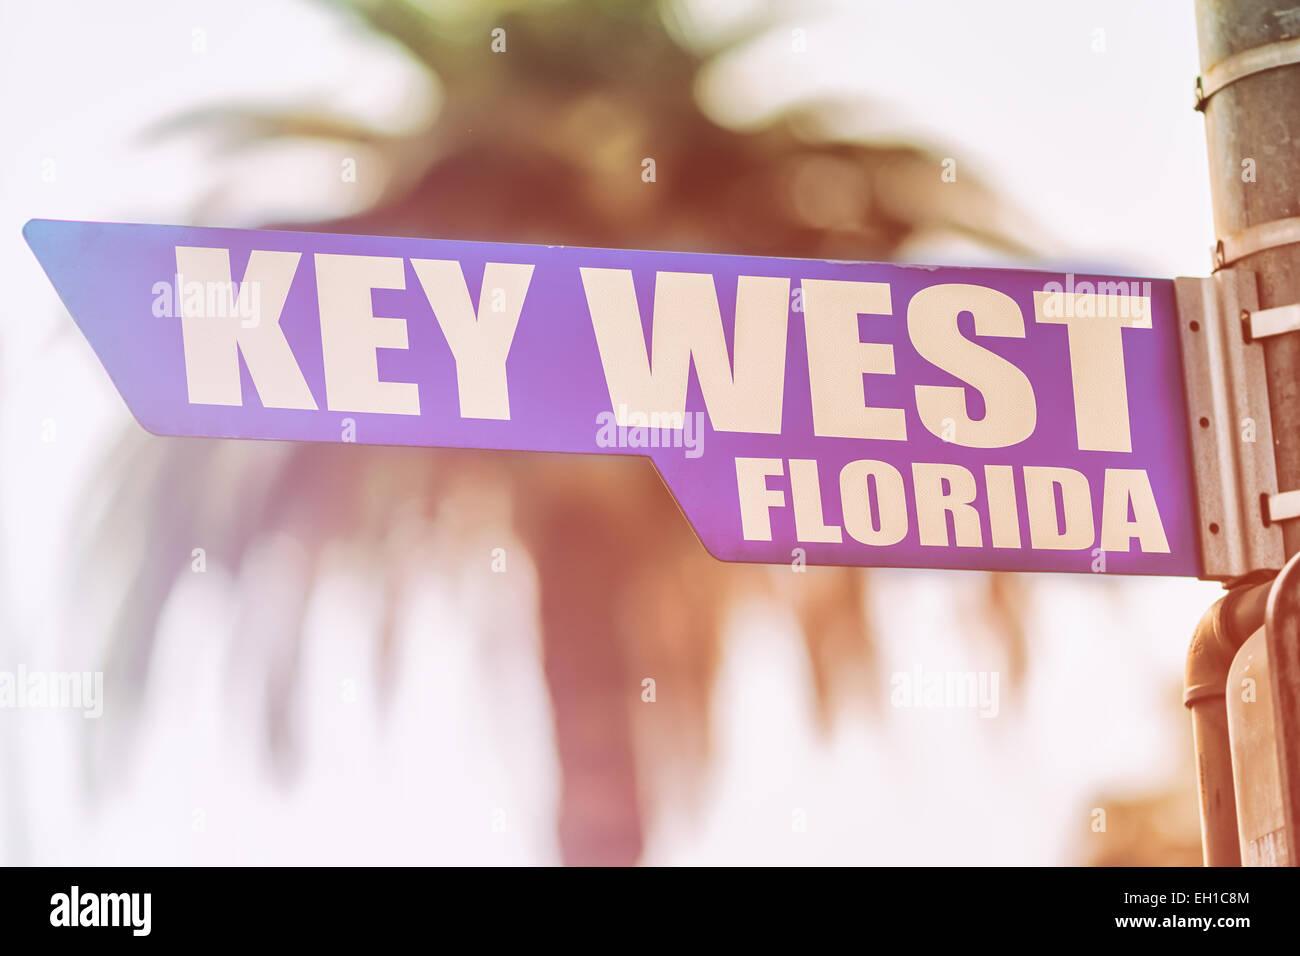 Key West Florida Street Sign - Stock Image